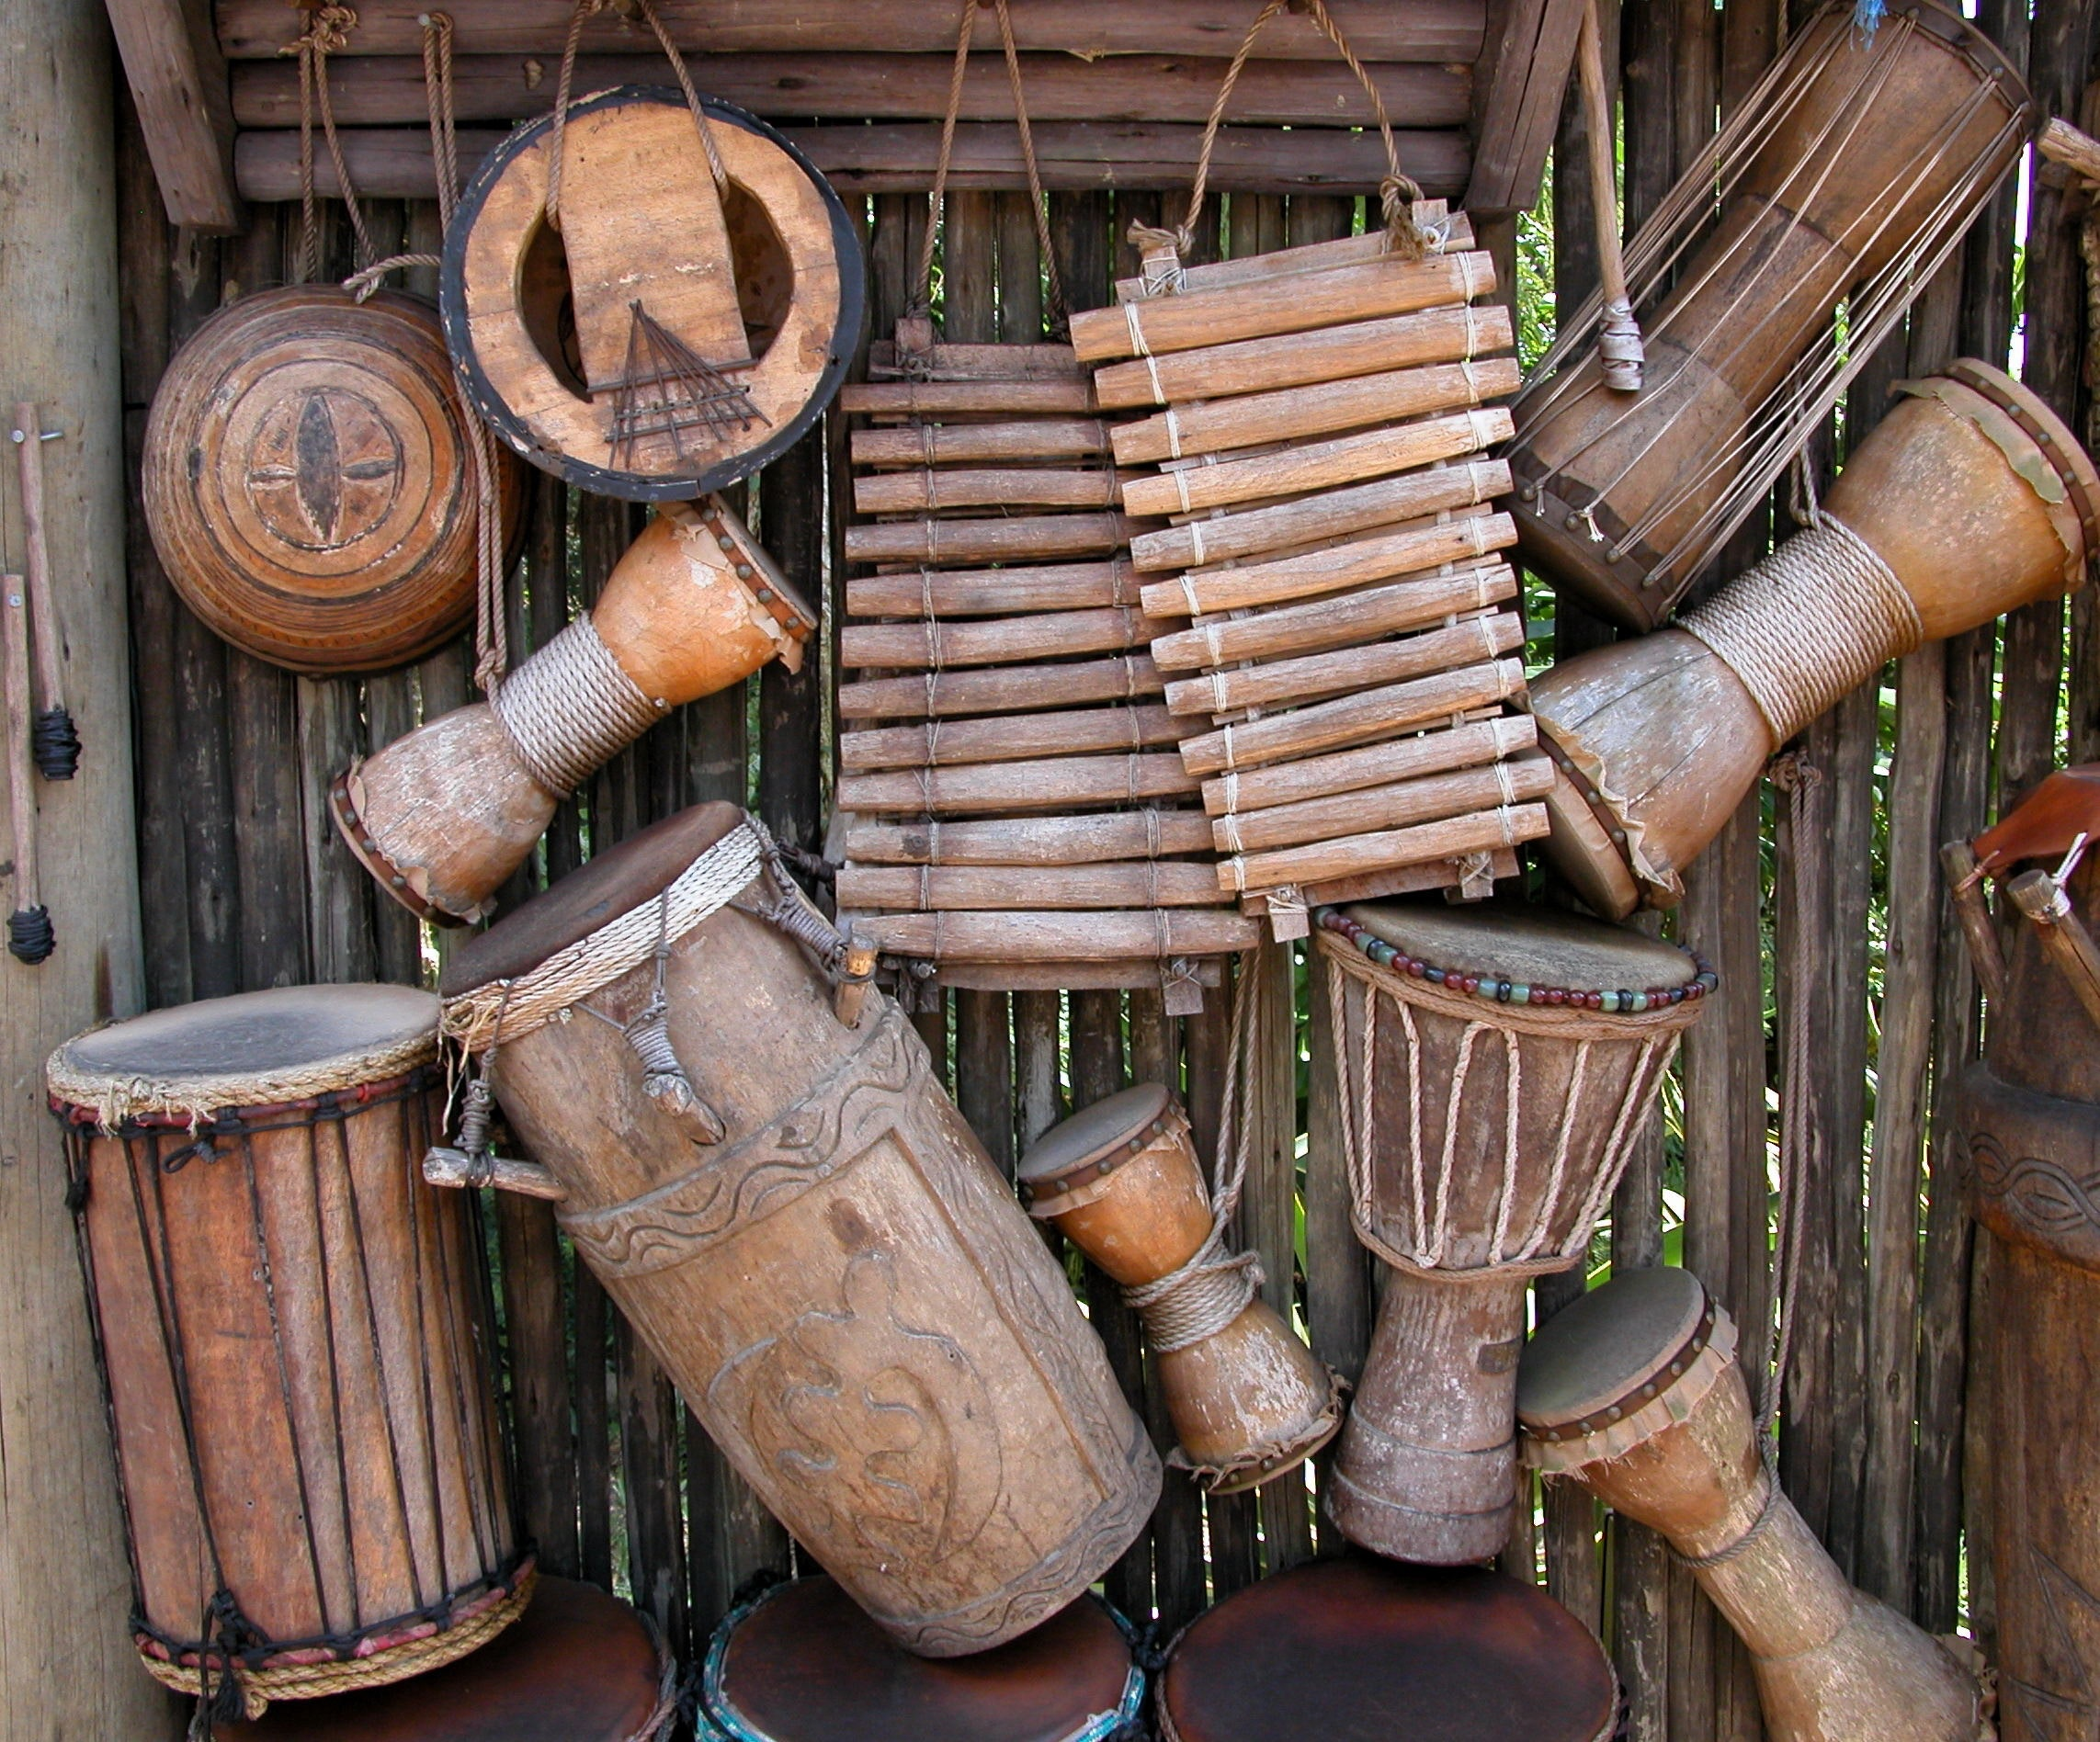 crafts-drums-handmade-158664